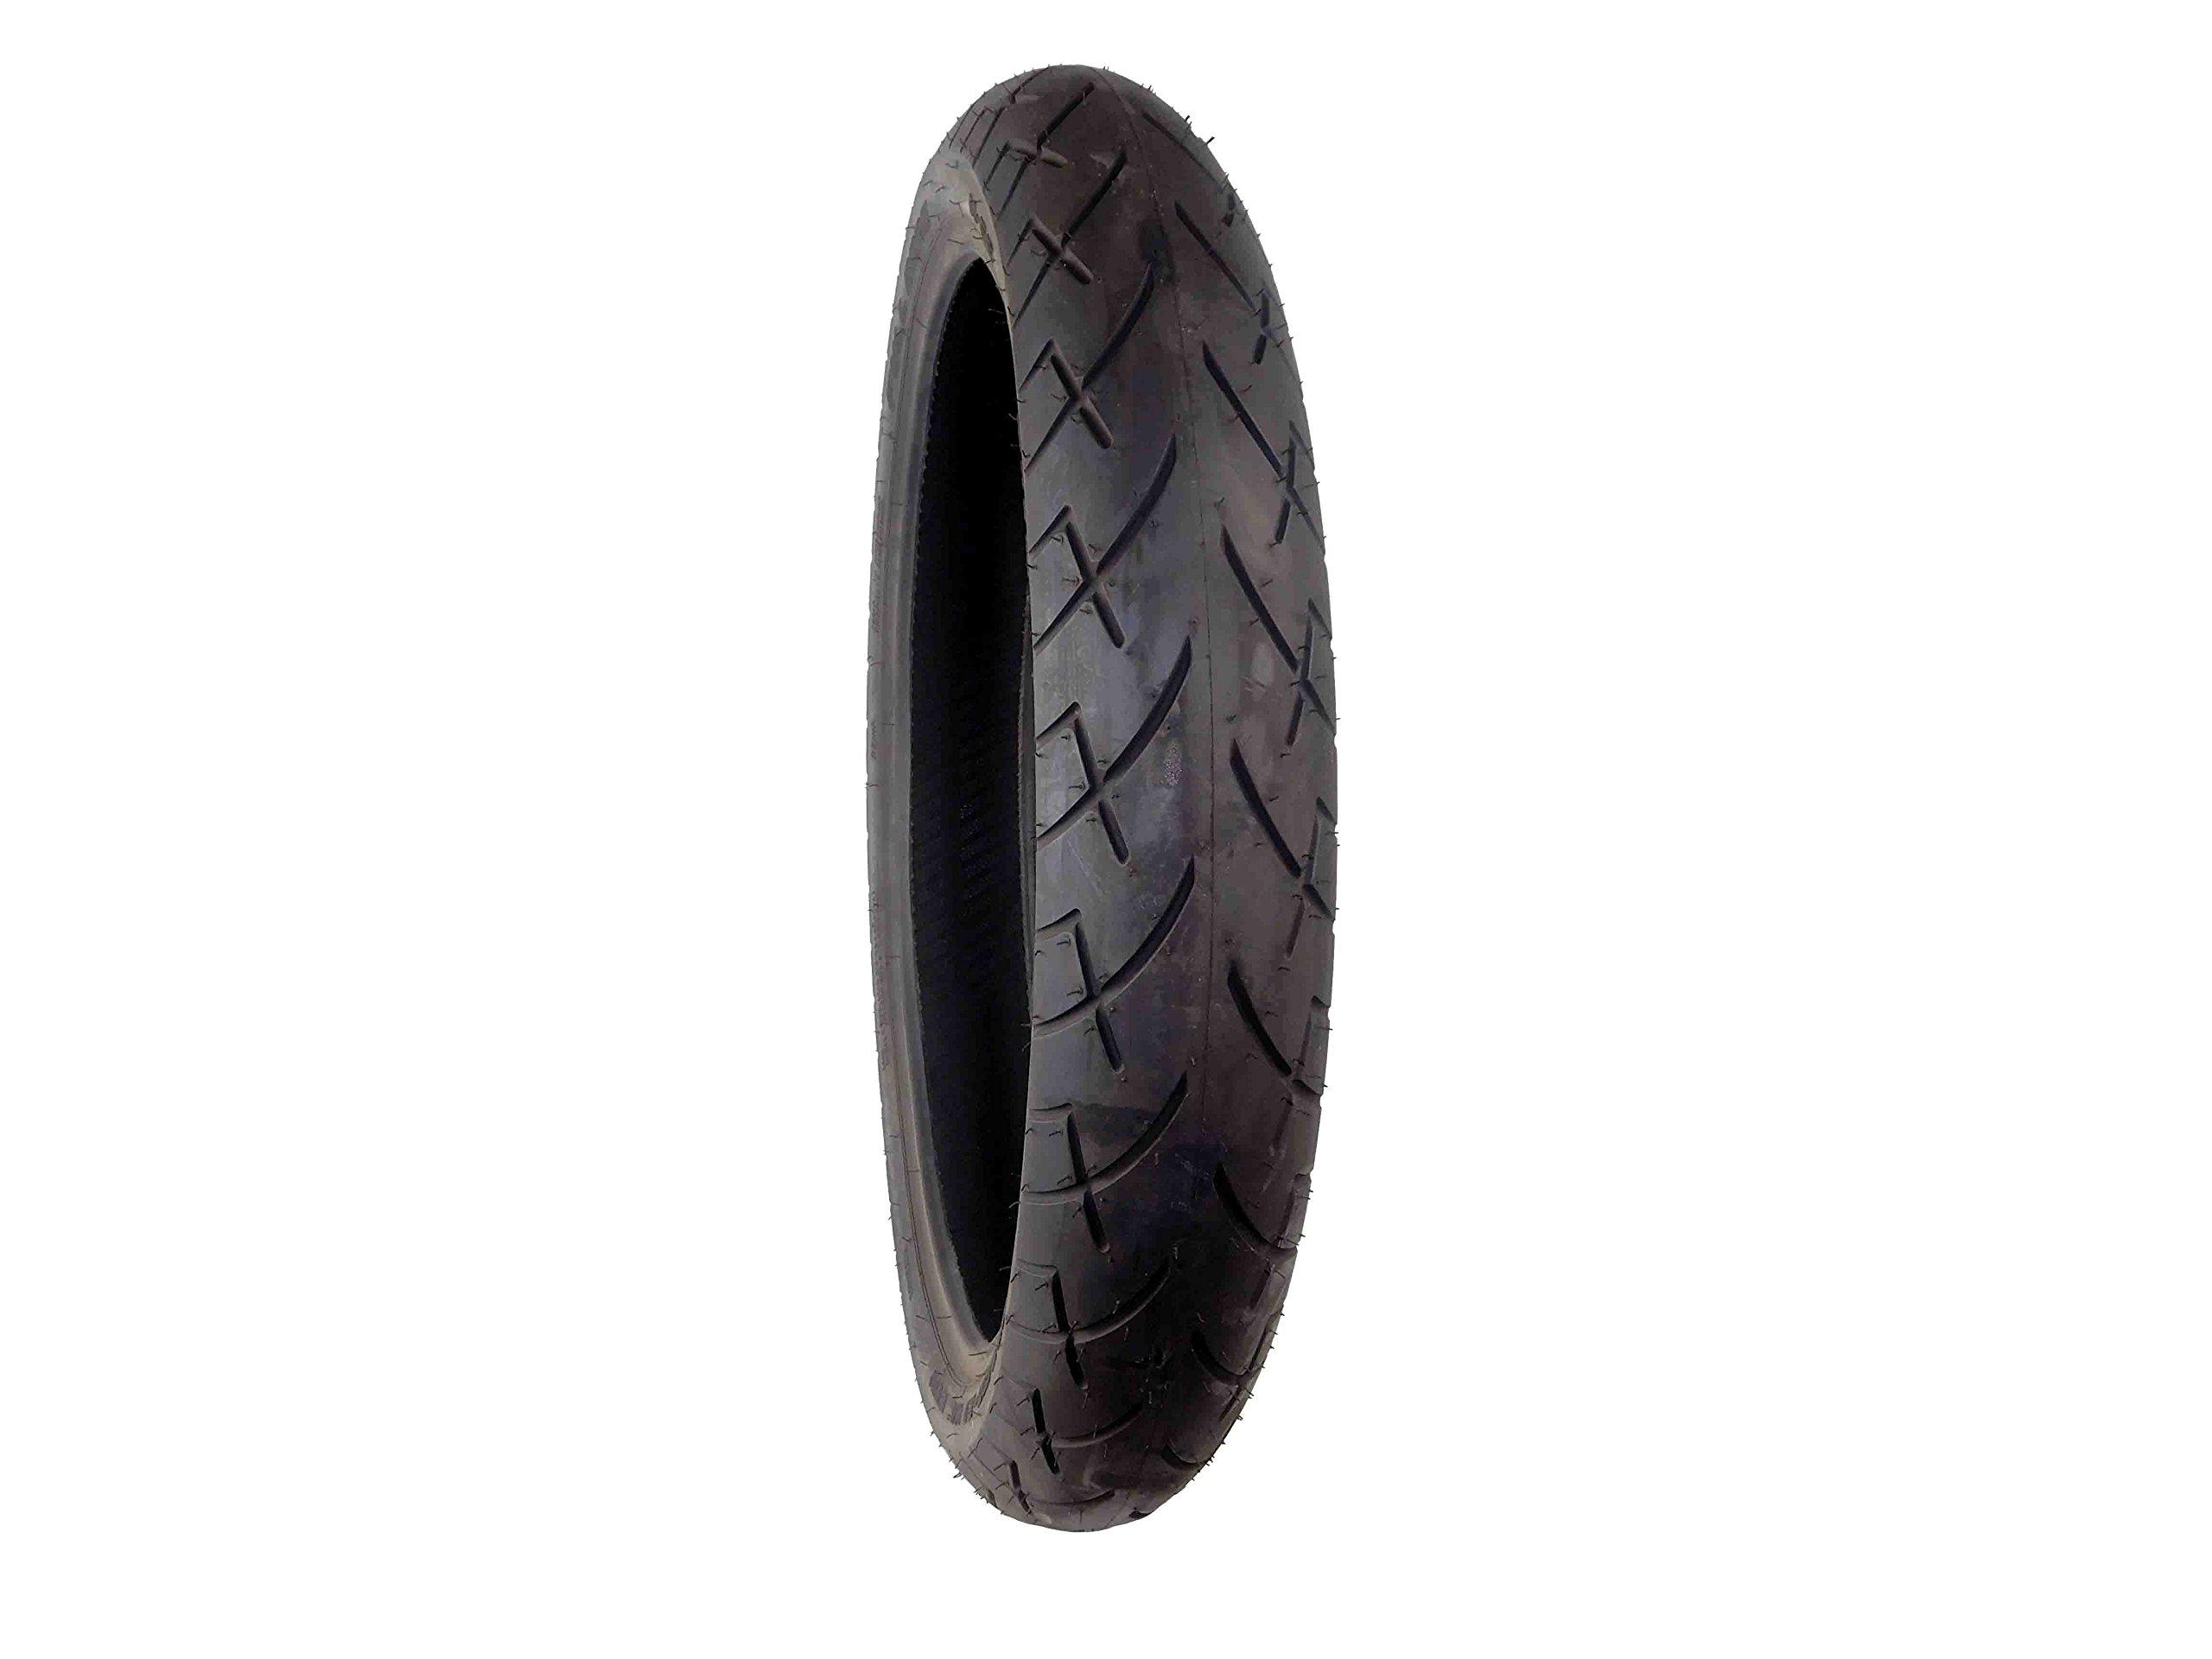 Full Bore M-66 Tour King Cruiser Motorcycle Tire (120/70-21)